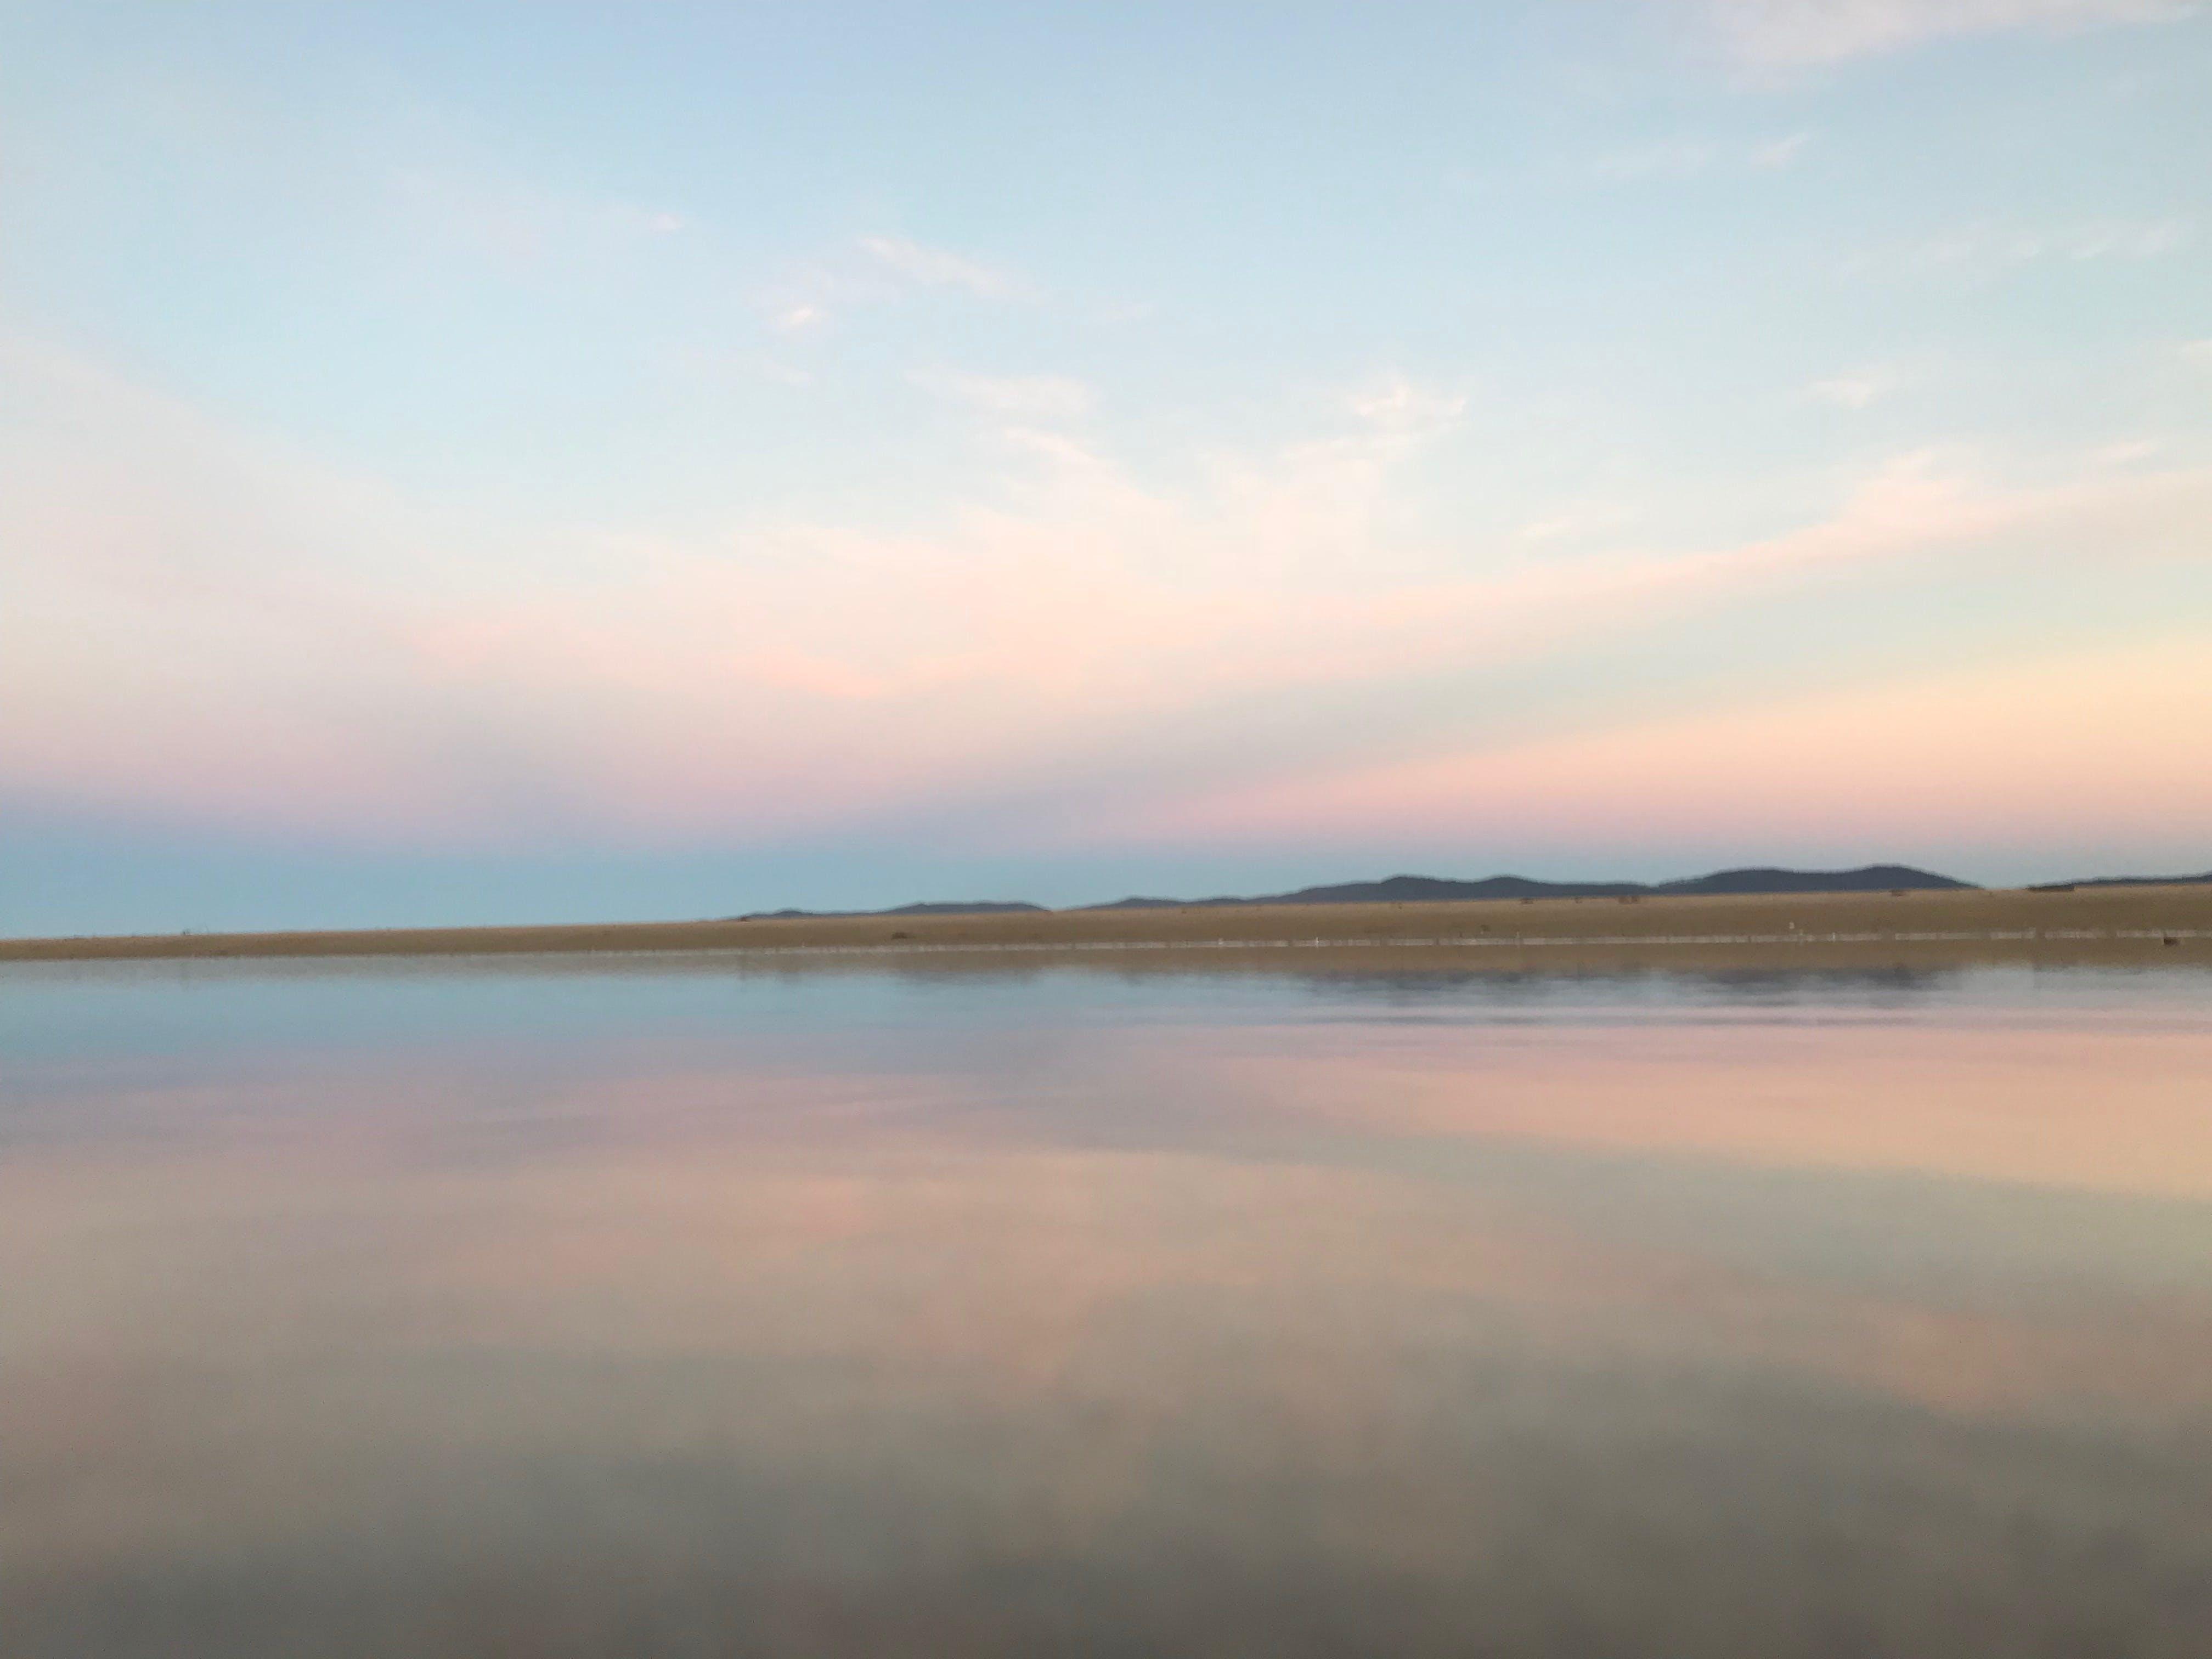 Free stock photo of reflections, sunset